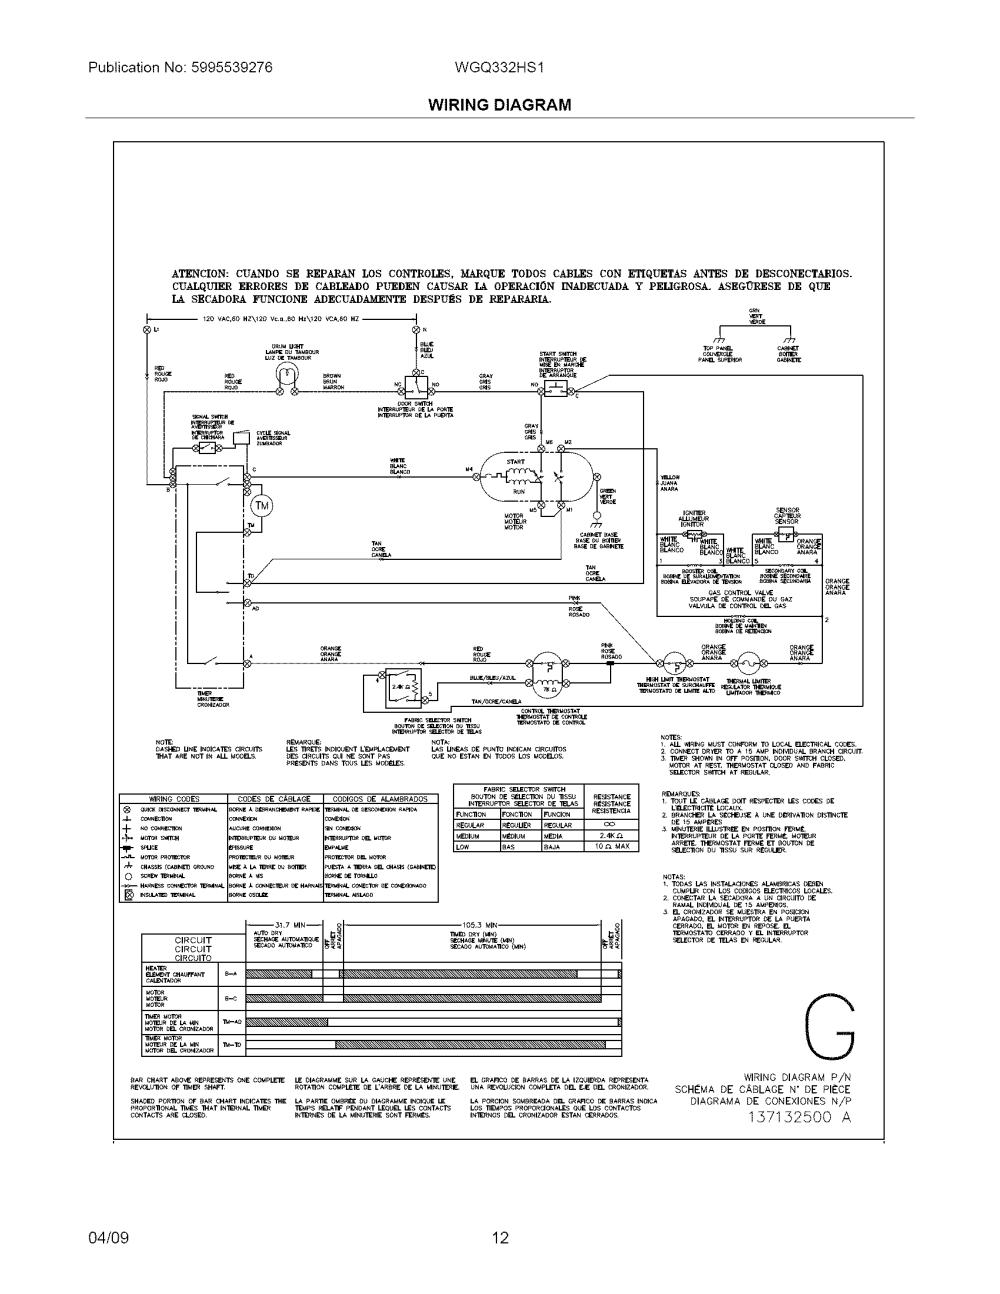 medium resolution of white westinghouse dryer wiring diagram white get free westinghouse dryer troubleshooting speed queen dryer wiring diagram